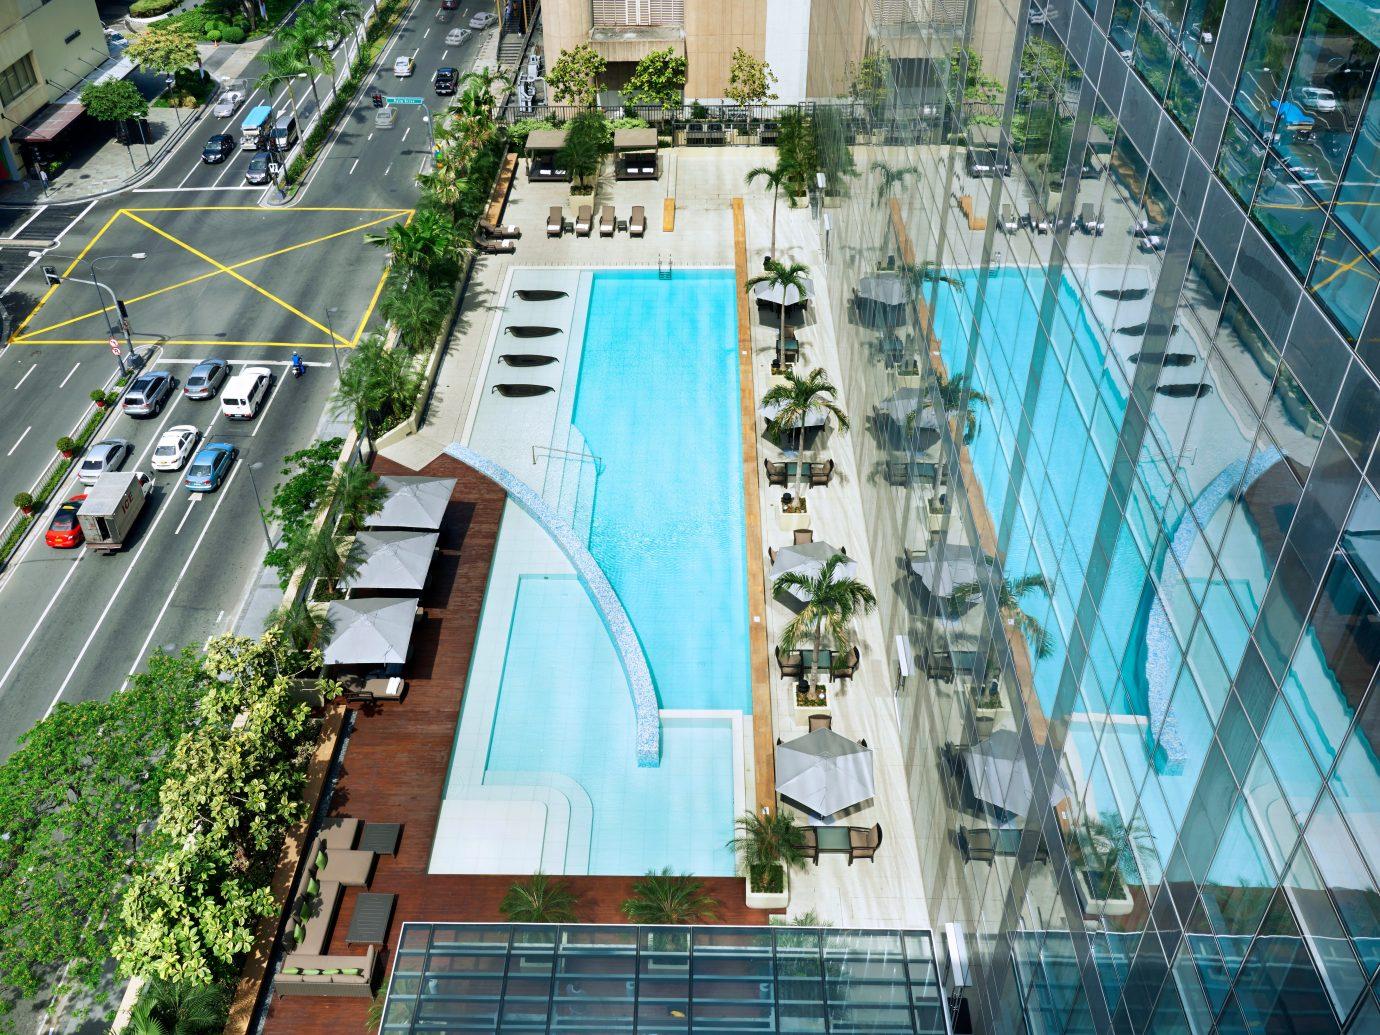 Hotels Play Pool Resort landmark urban area neighbourhood aerial photography skyscraper Downtown cityscape urban design tower block dock